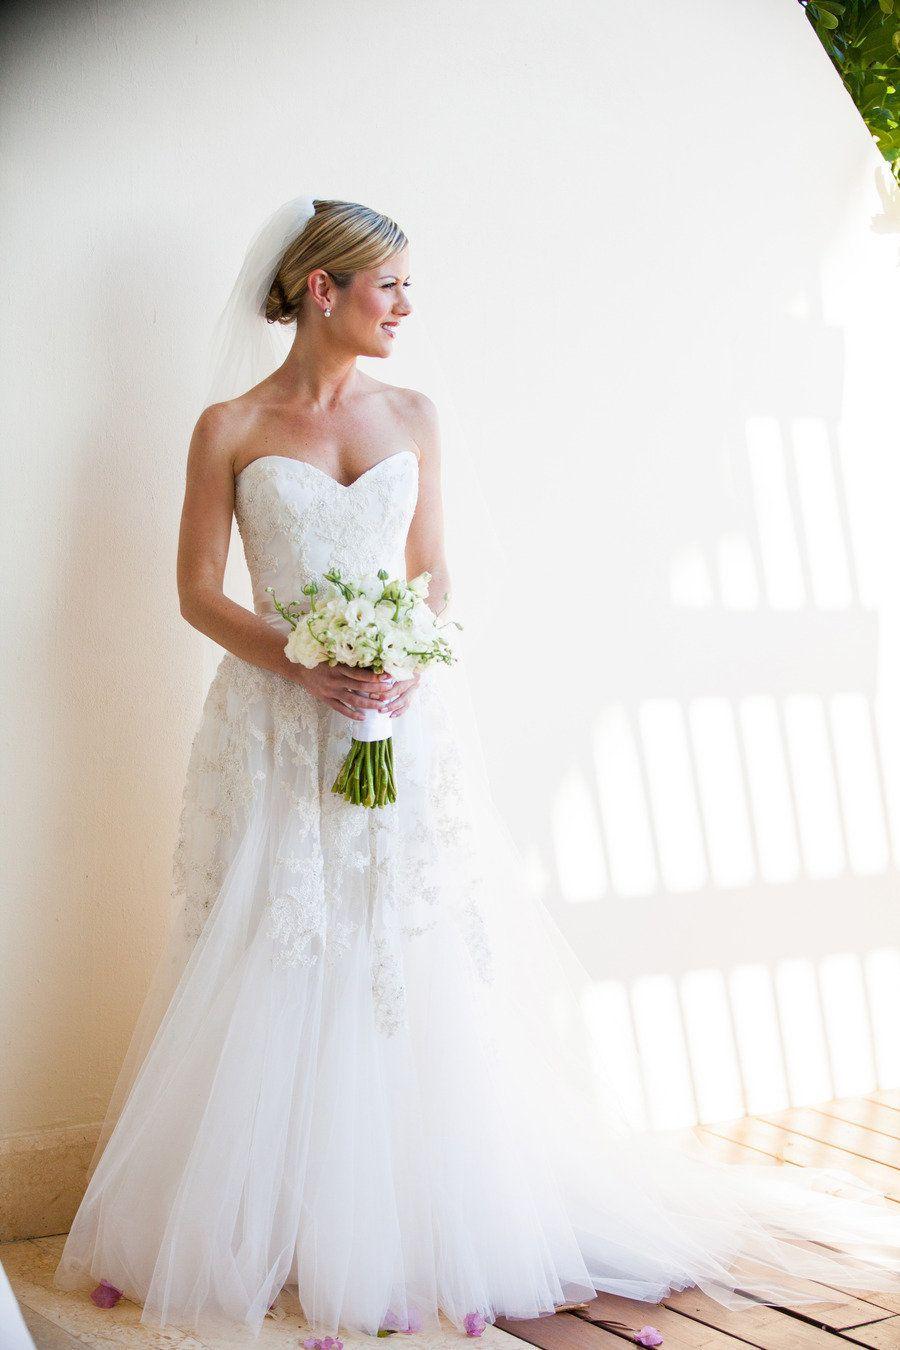 Playa Del Carmen Wedding from Elizabeth Medina Photography